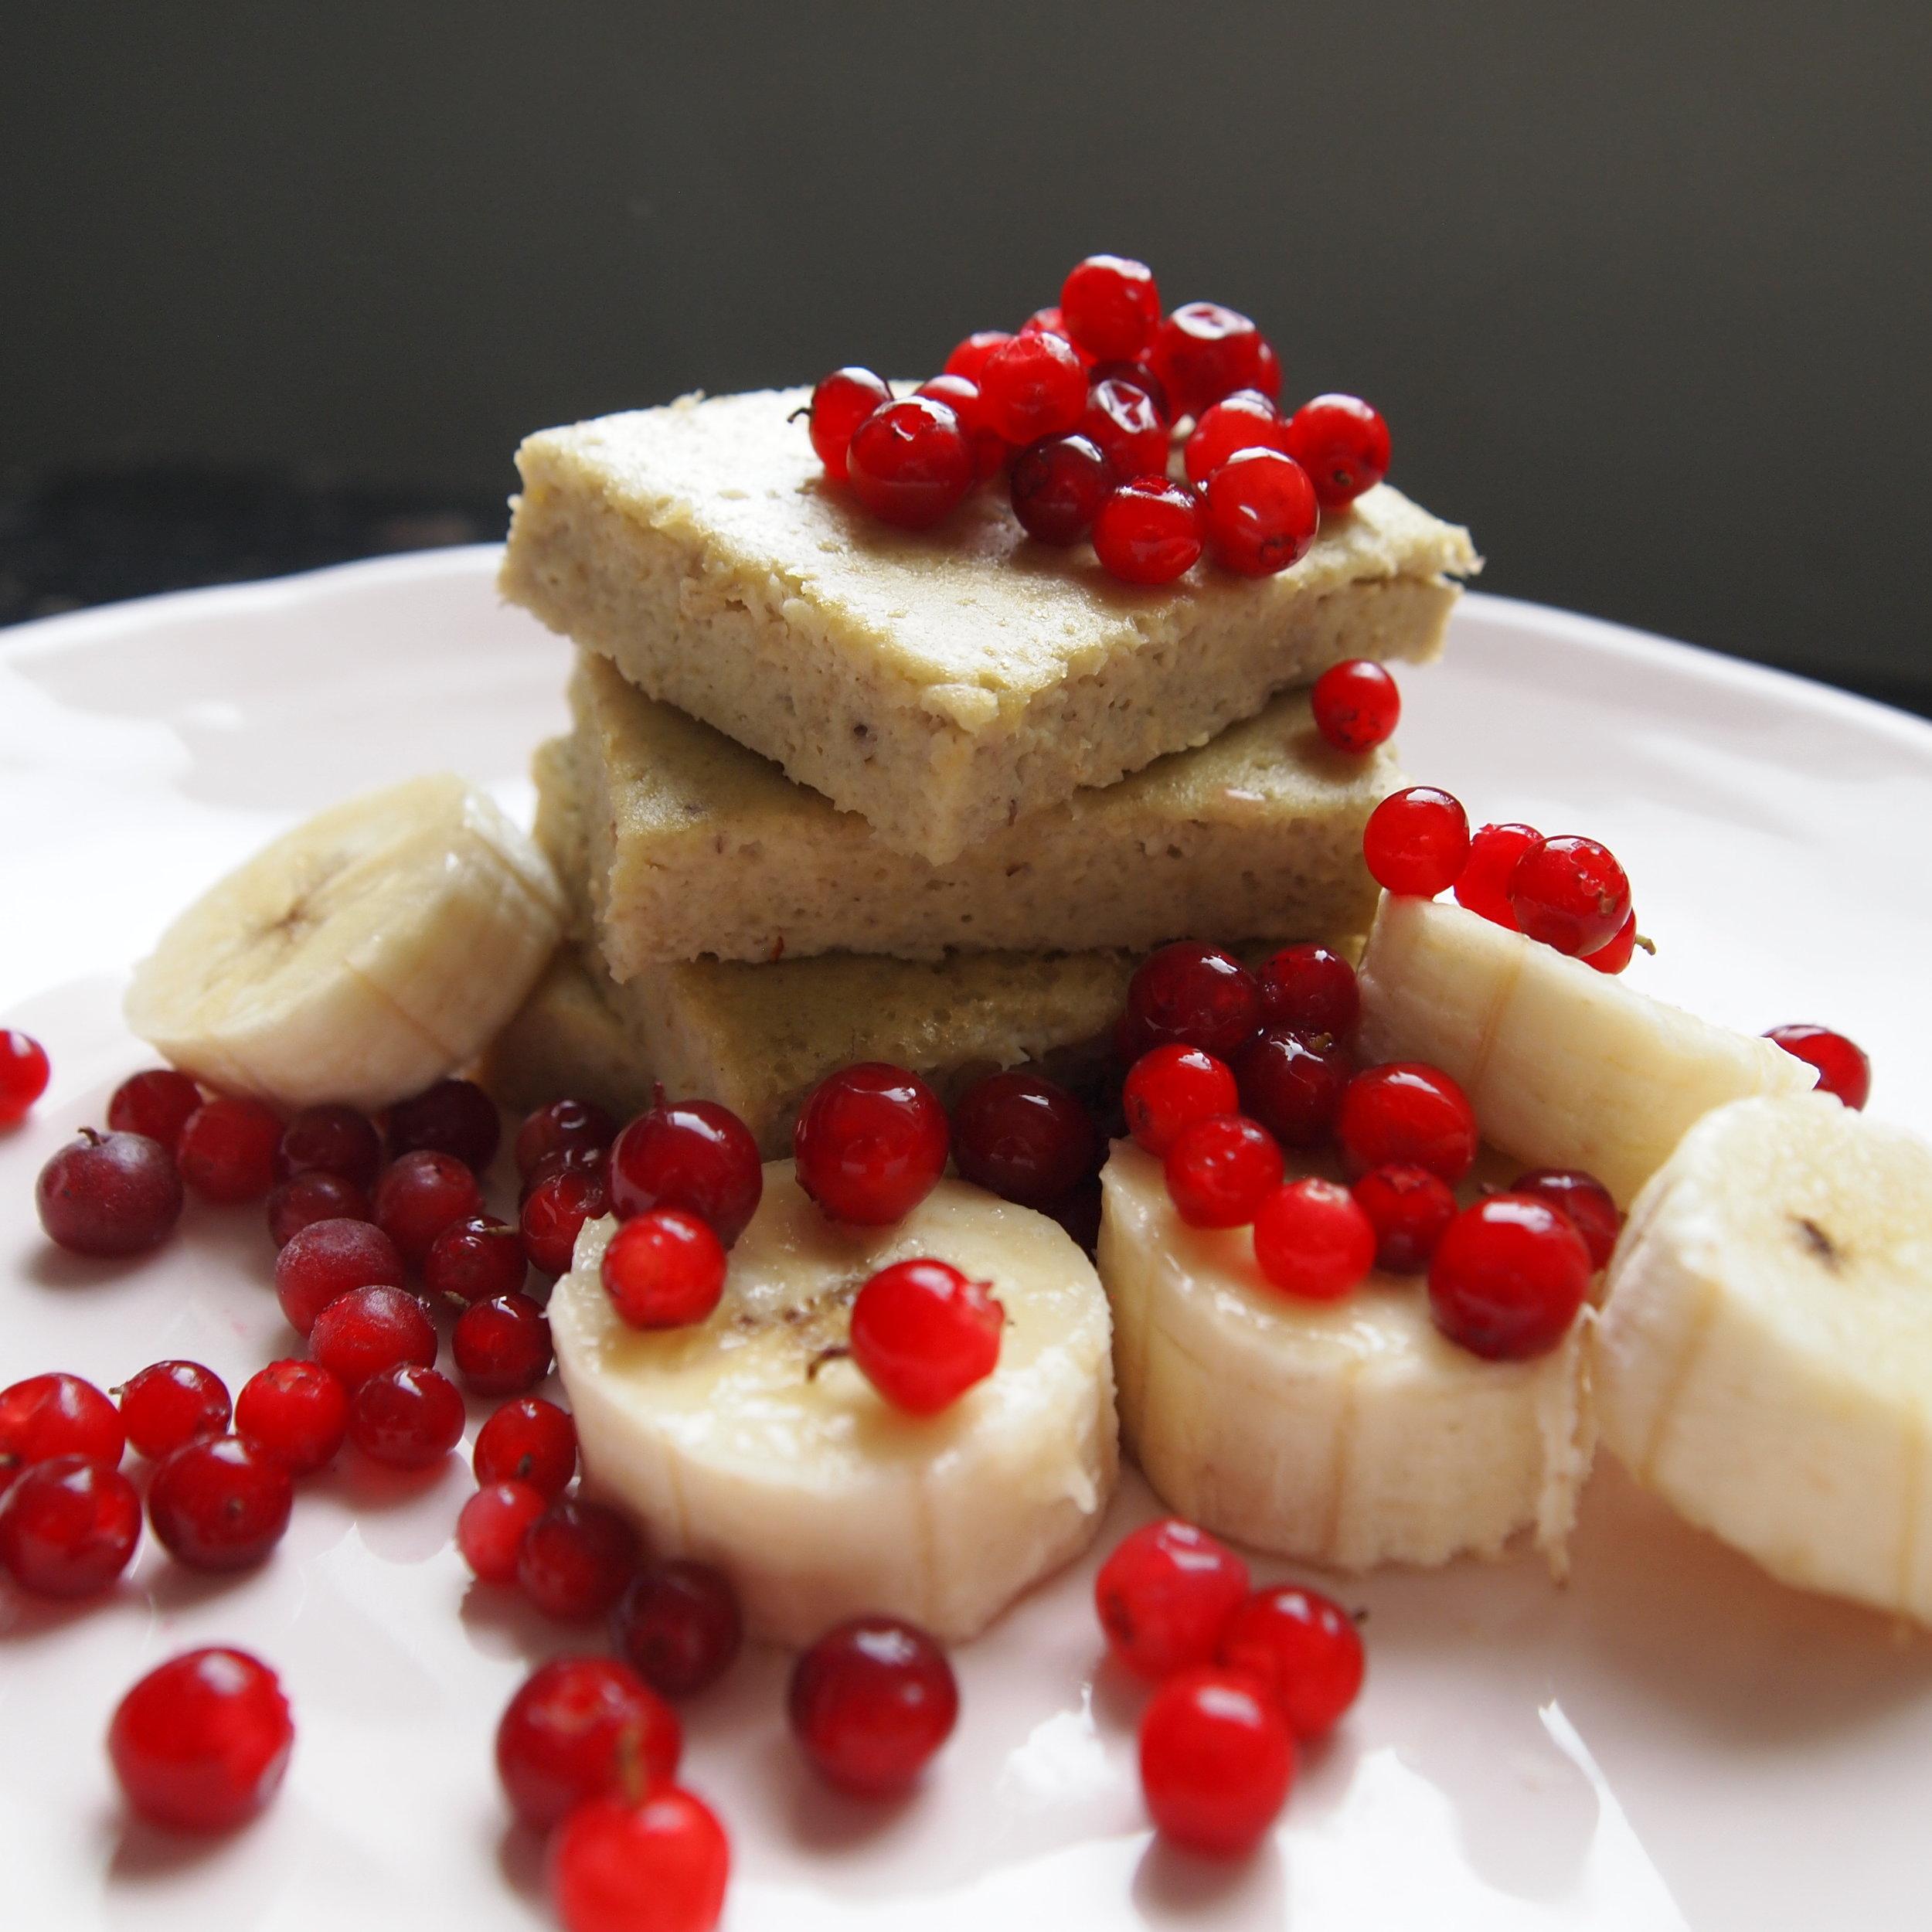 Sormiruokailijan banaanipannukakku eli munakaspannari.